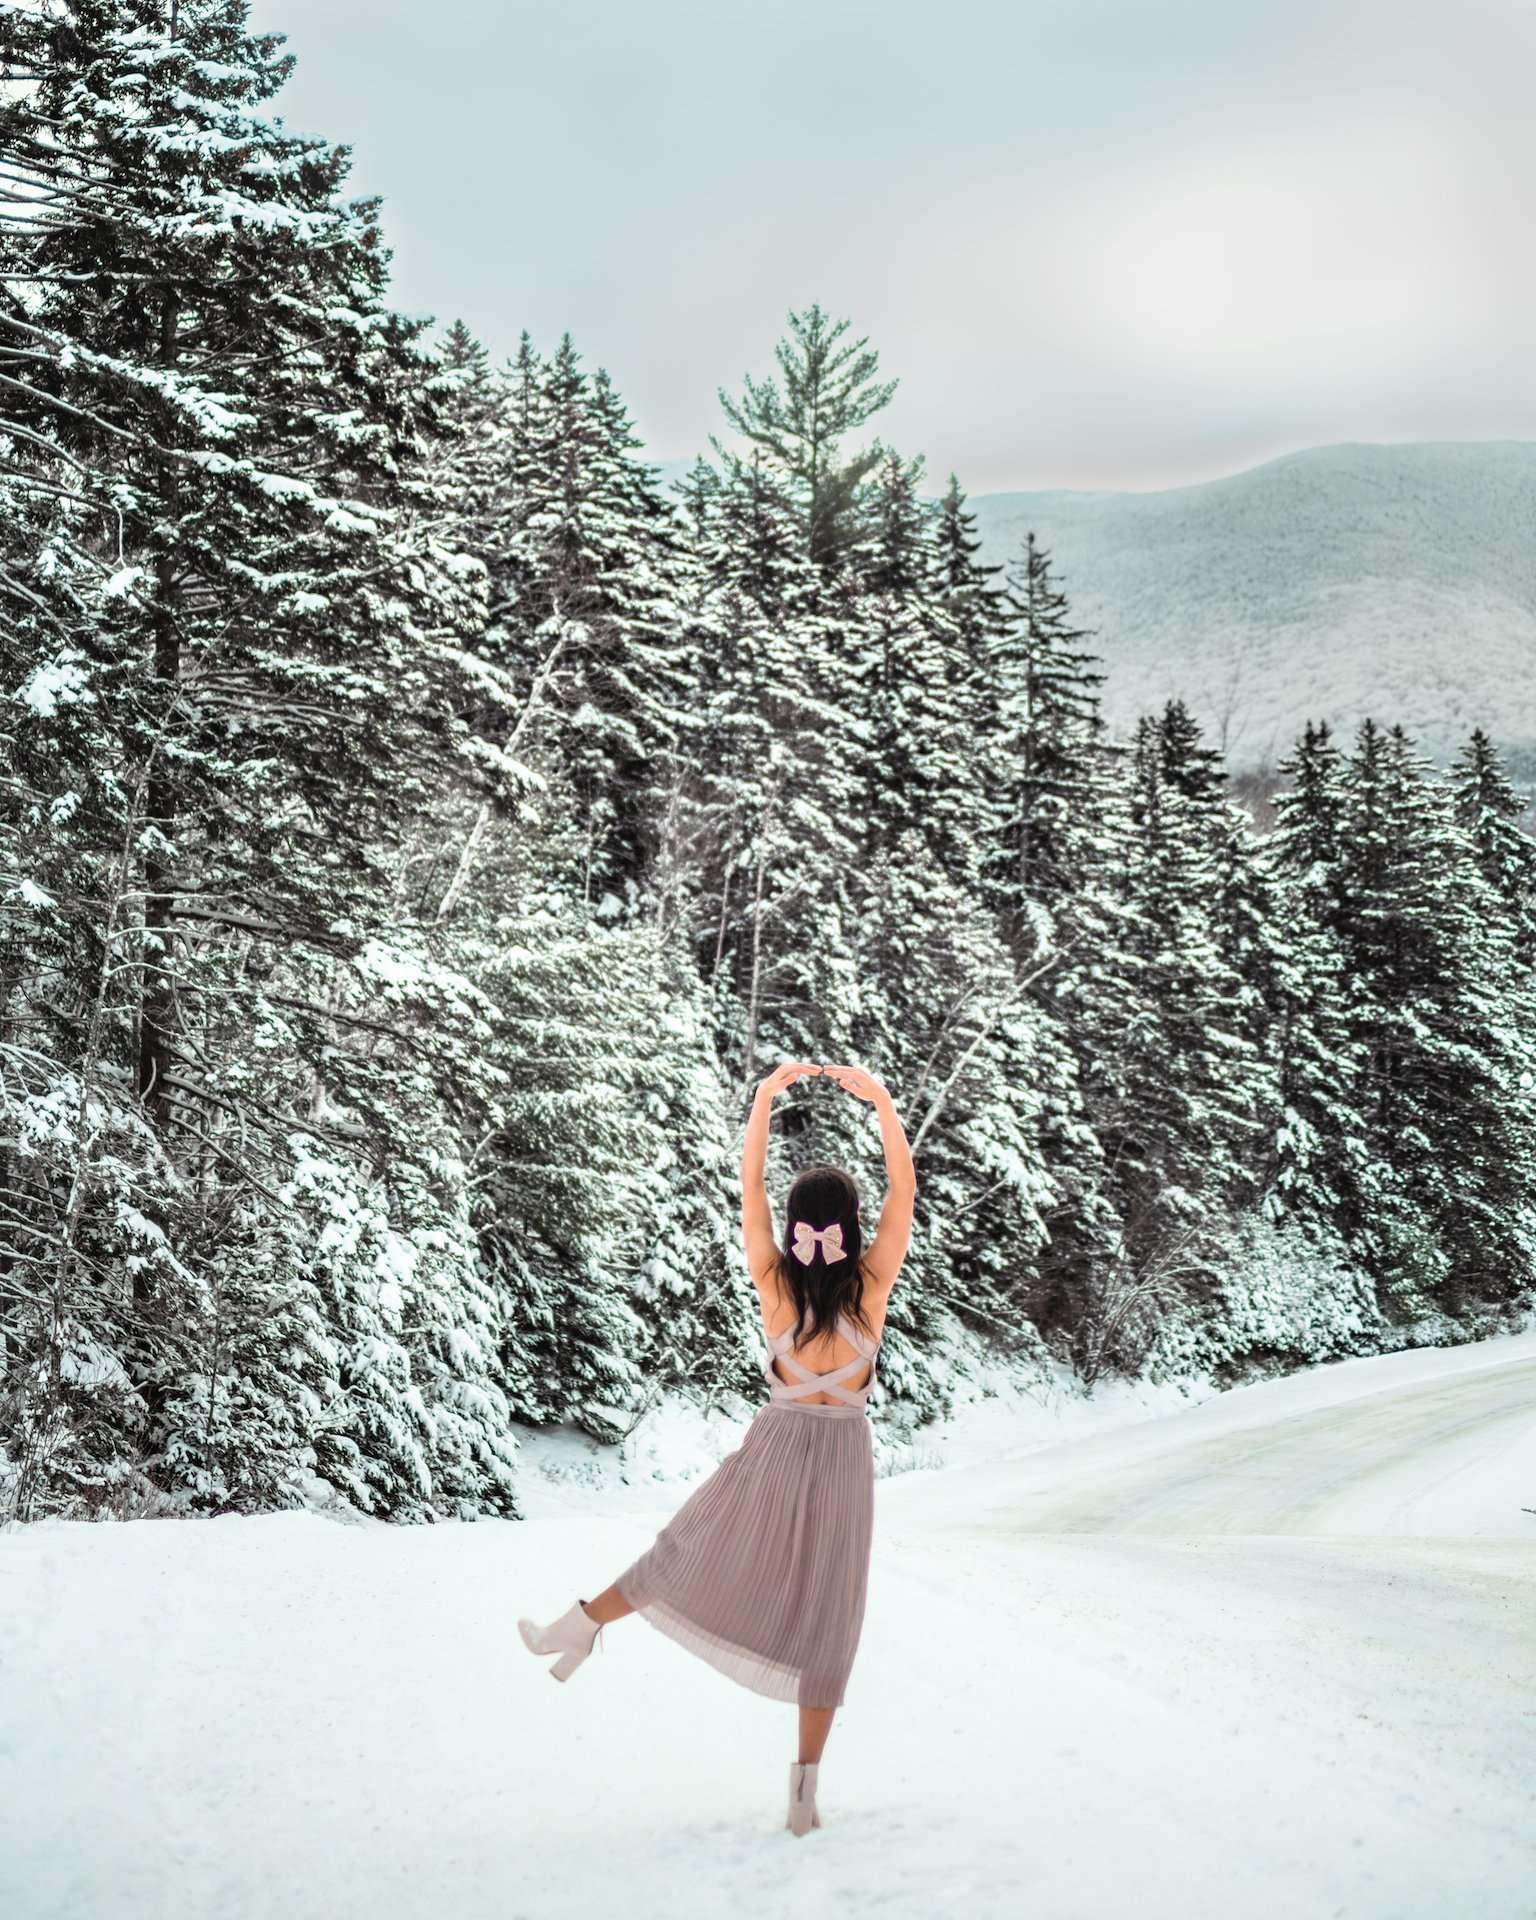 girl in dress dancing in snow from back